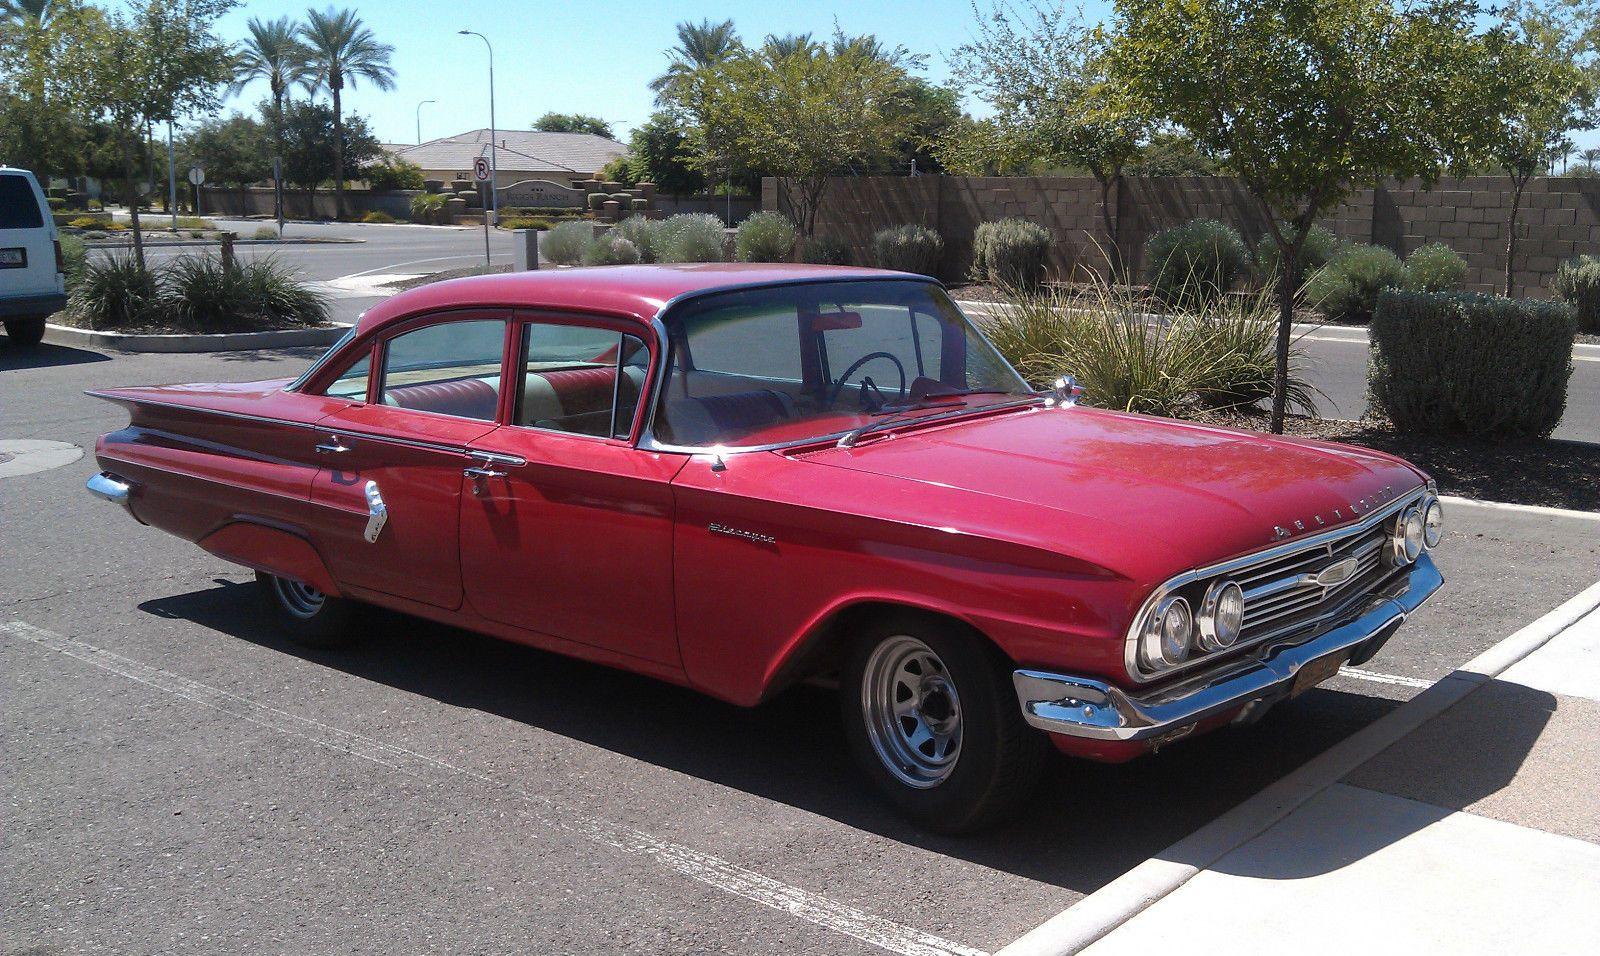 1960 Chevrolet Impala Base Hardtop 4 Door Chevrolet General